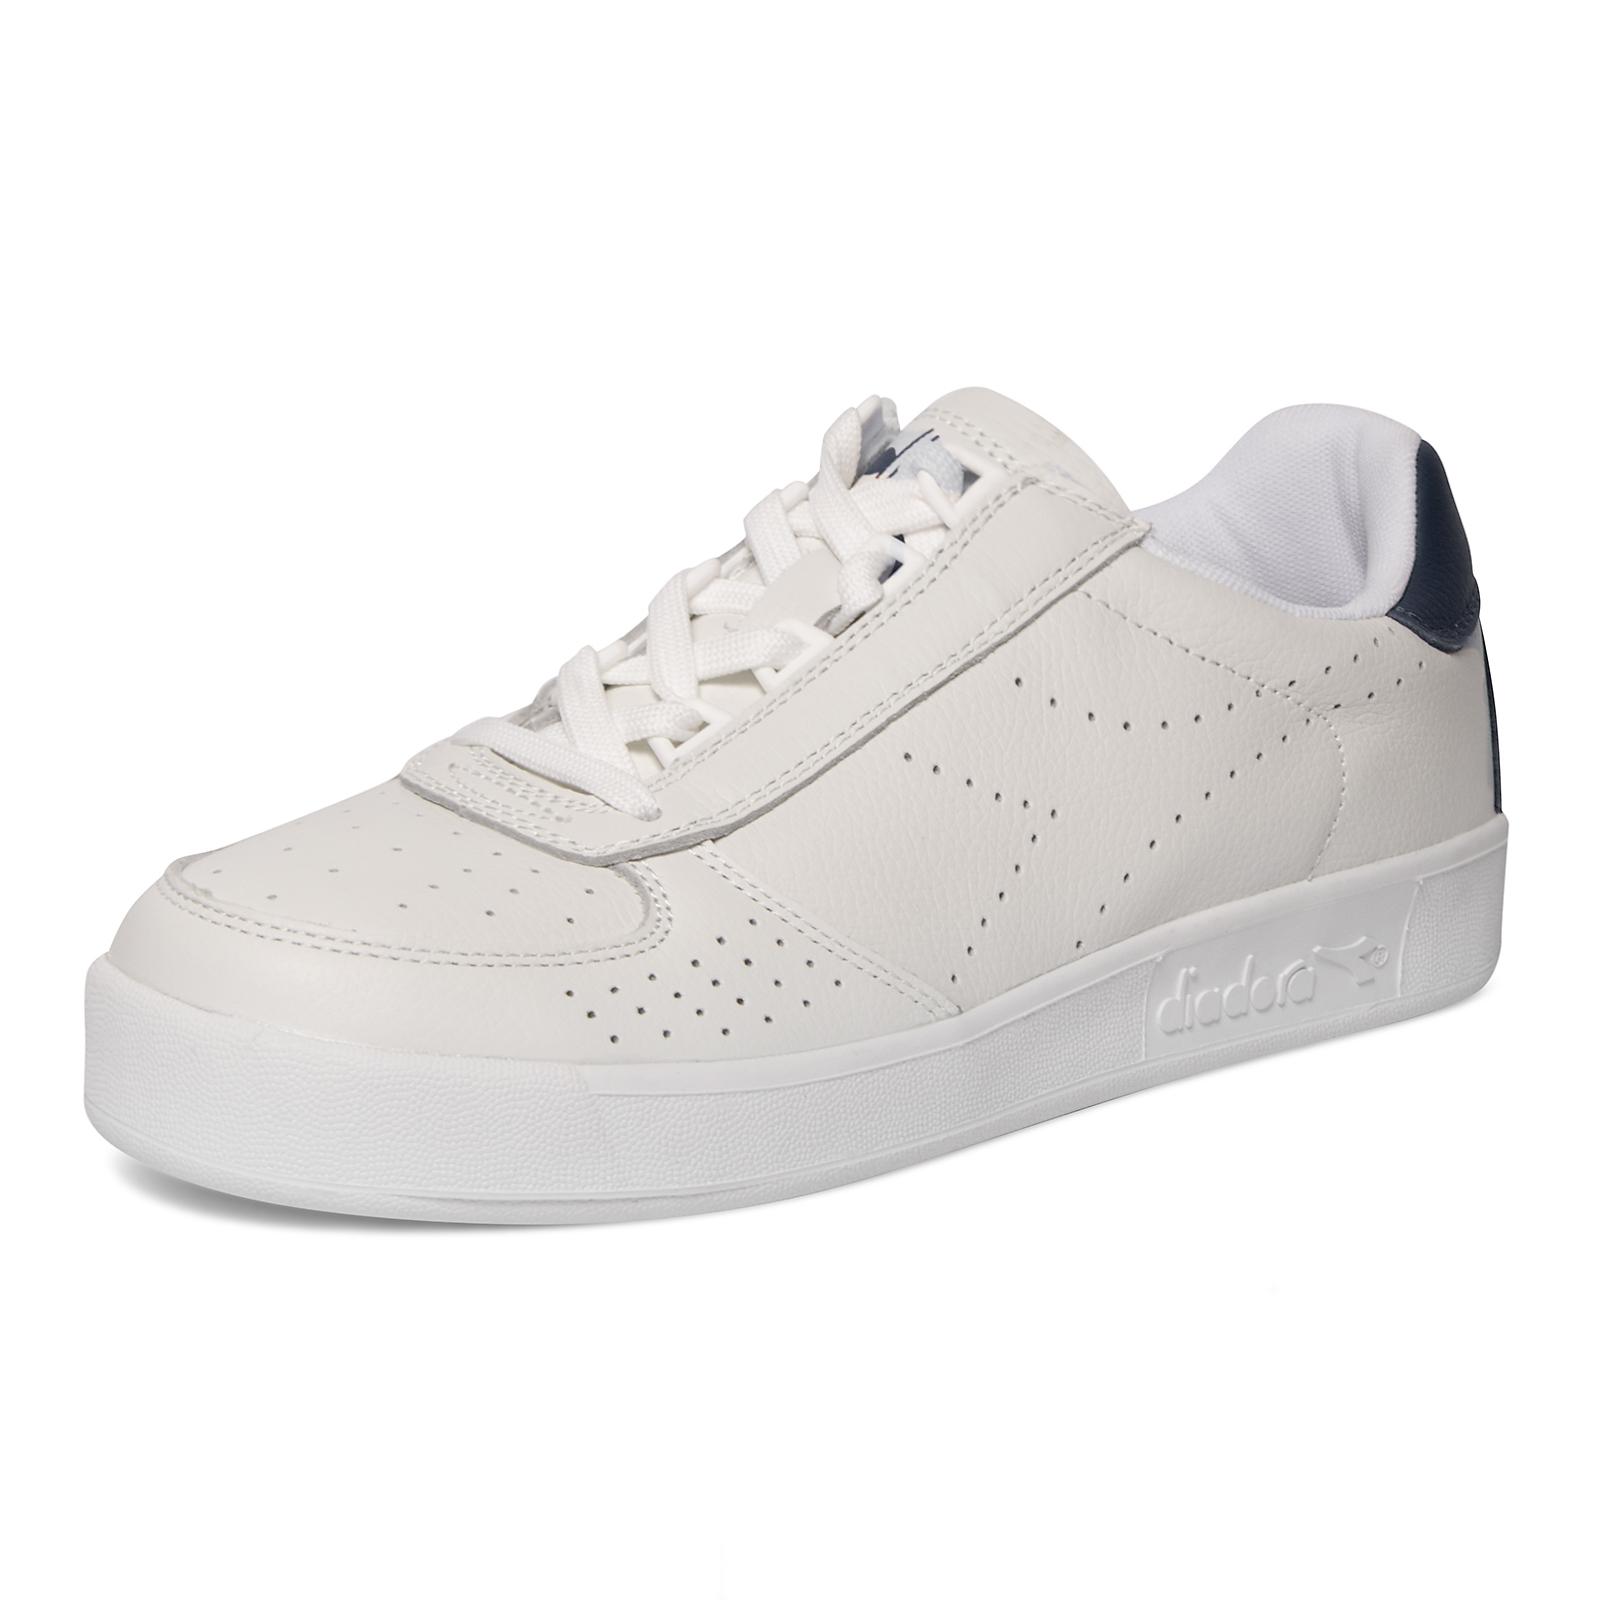 DIADORA scarpe B.ELITE PREMIUM L WHITE BLUE CASPIAN SEA sneakers  ac785188eef